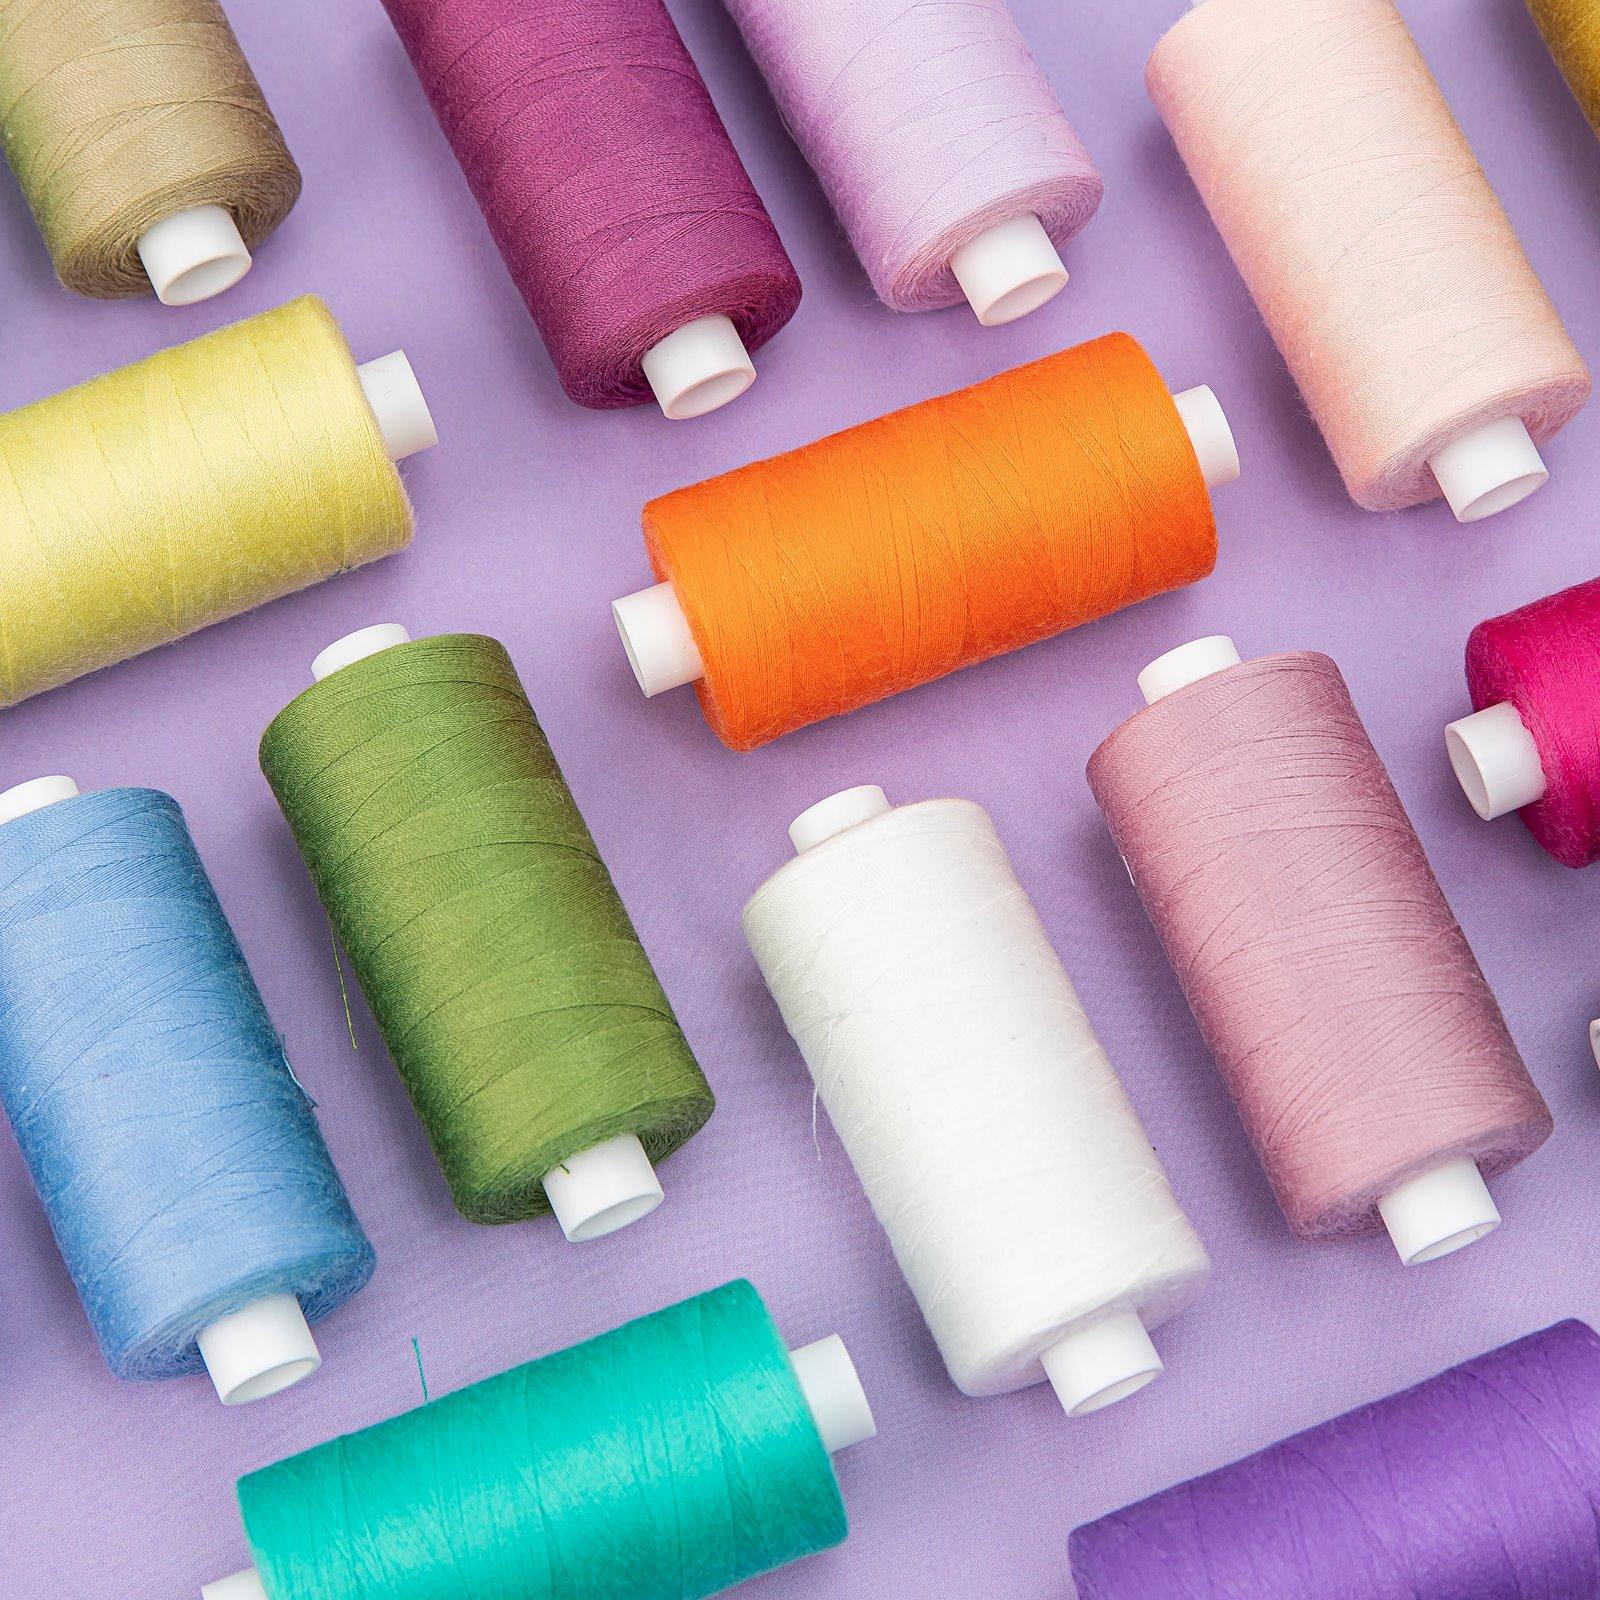 Sewing thread light green 1000m 12057_12098_12048_12010_12107_12019_12004_12002_12069_12108_12086_12062_12006_bundle